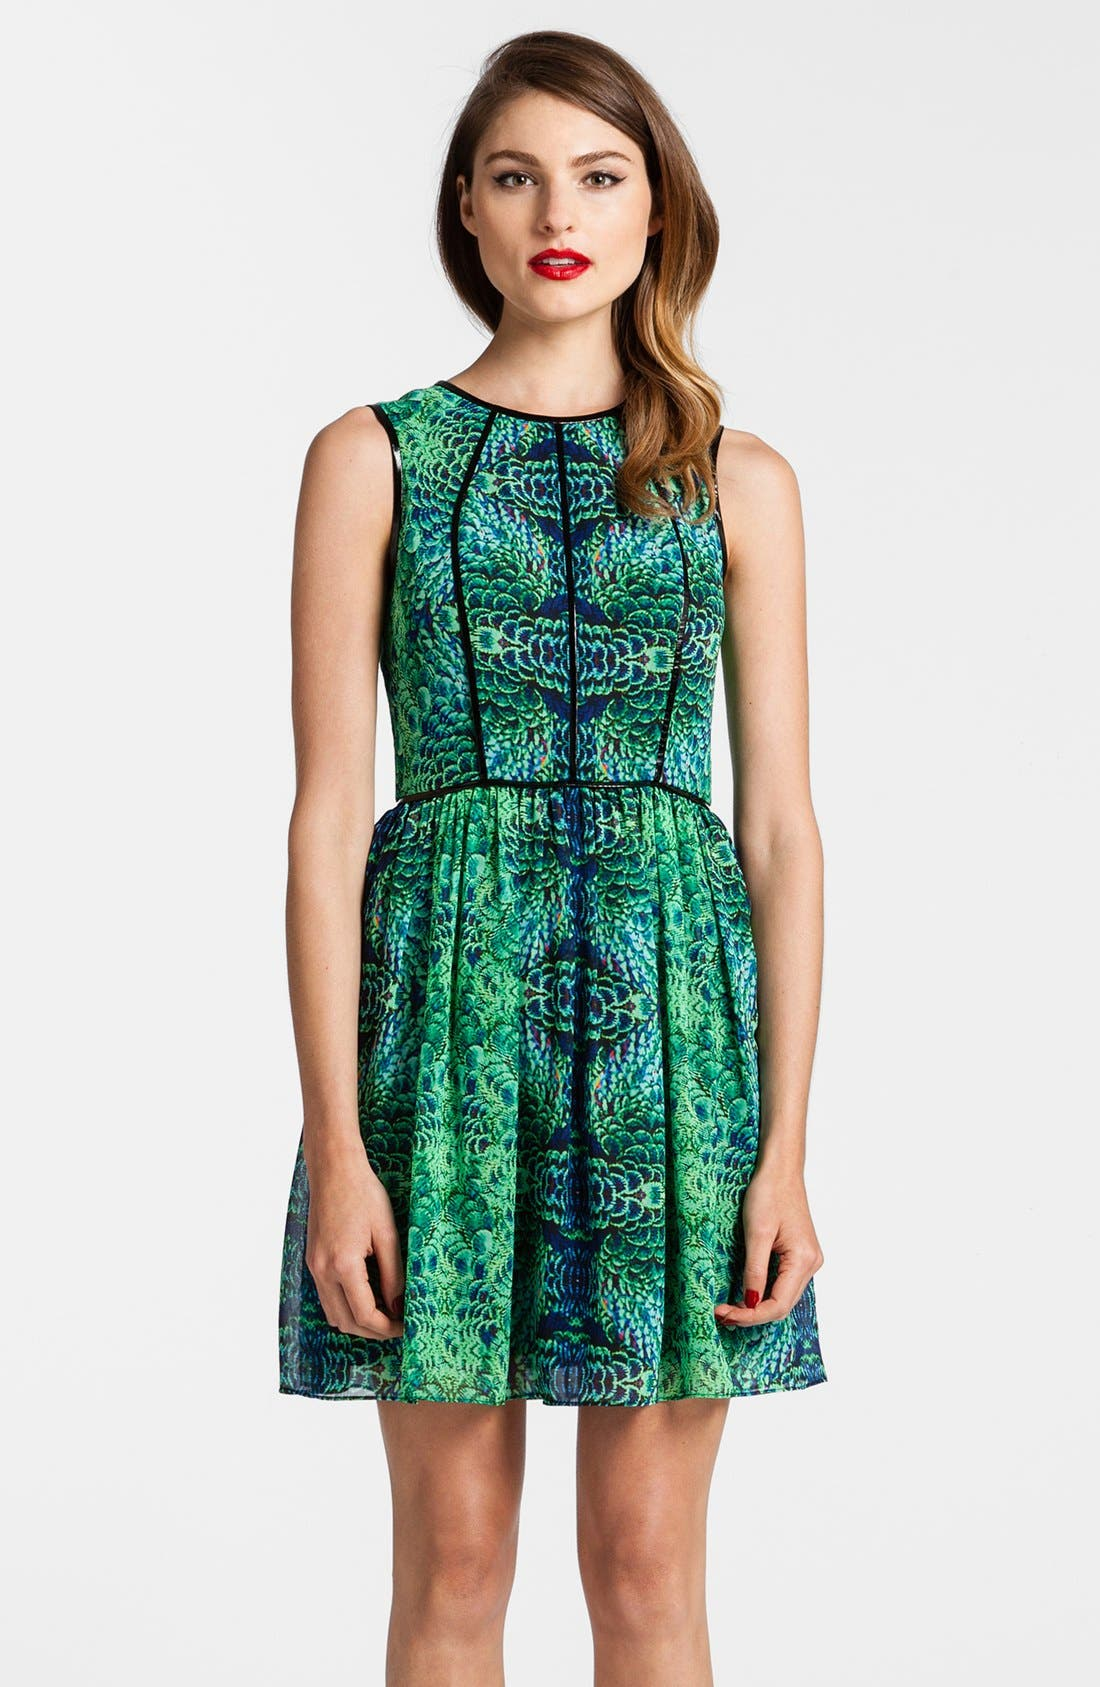 Main Image - Cynthia Steffe Faux Leather Piping Print Chiffon Fit & Flare Dress